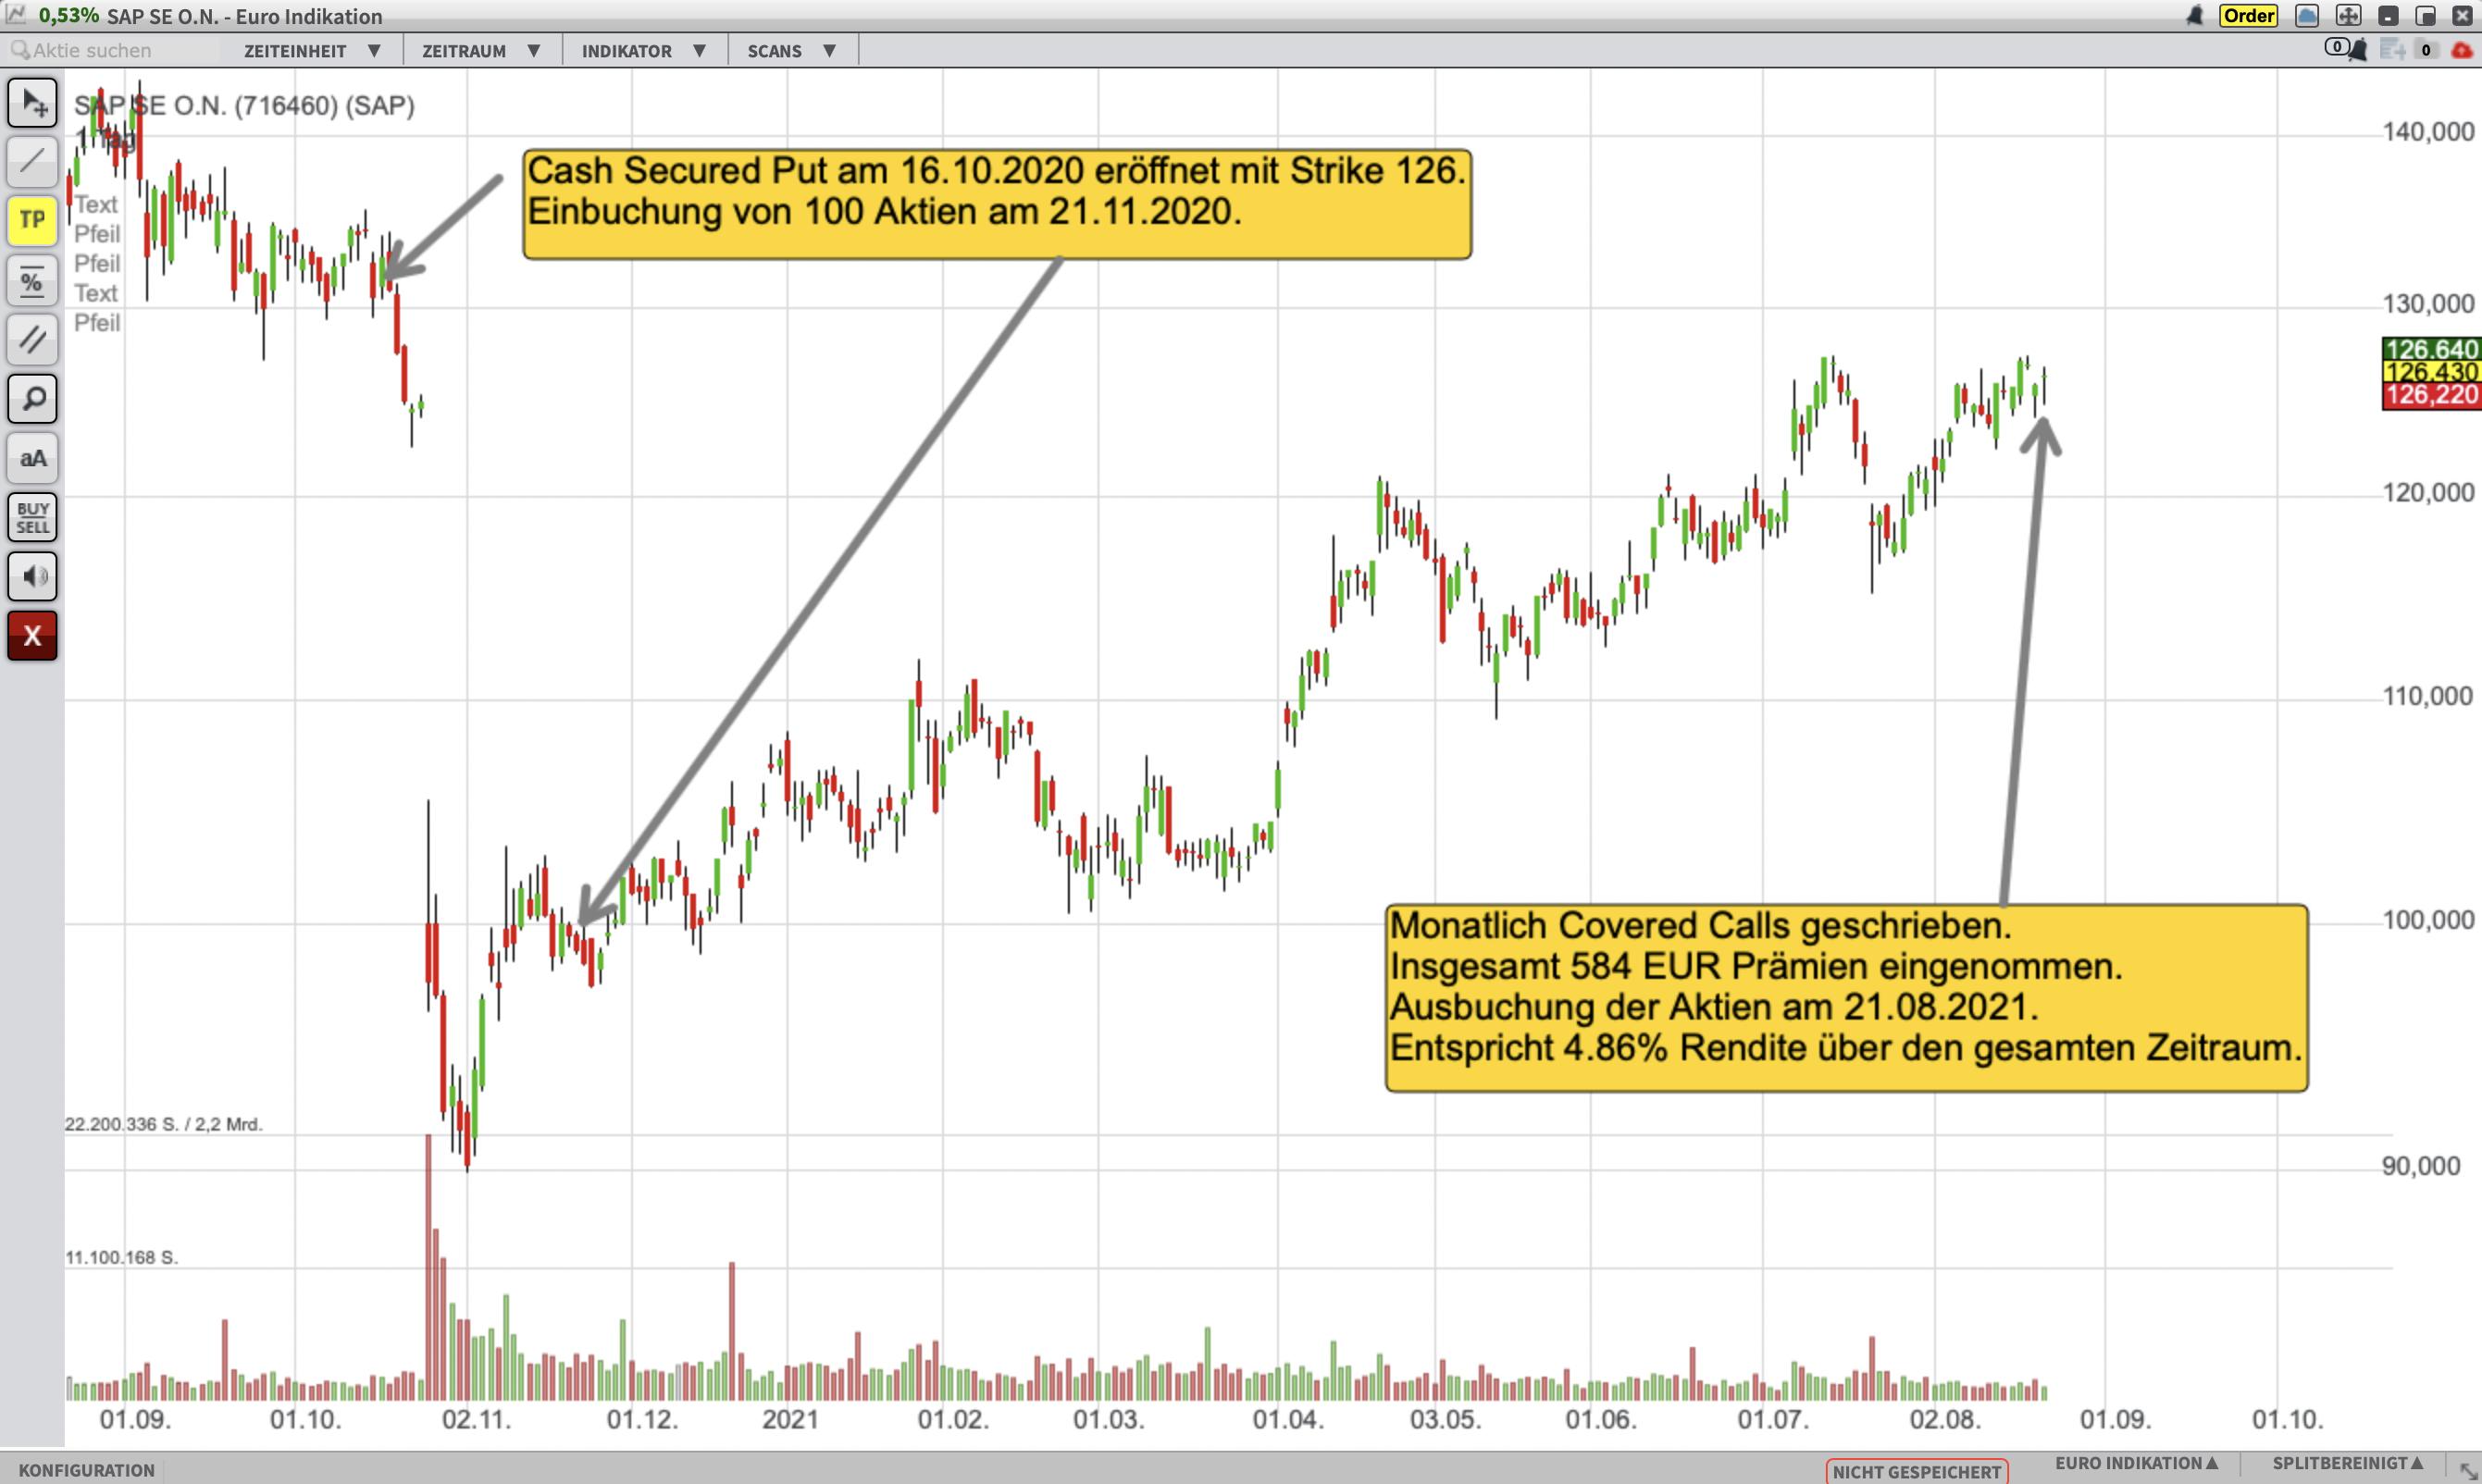 Tradeverlauf_SAP_Okt2020-Aug2021